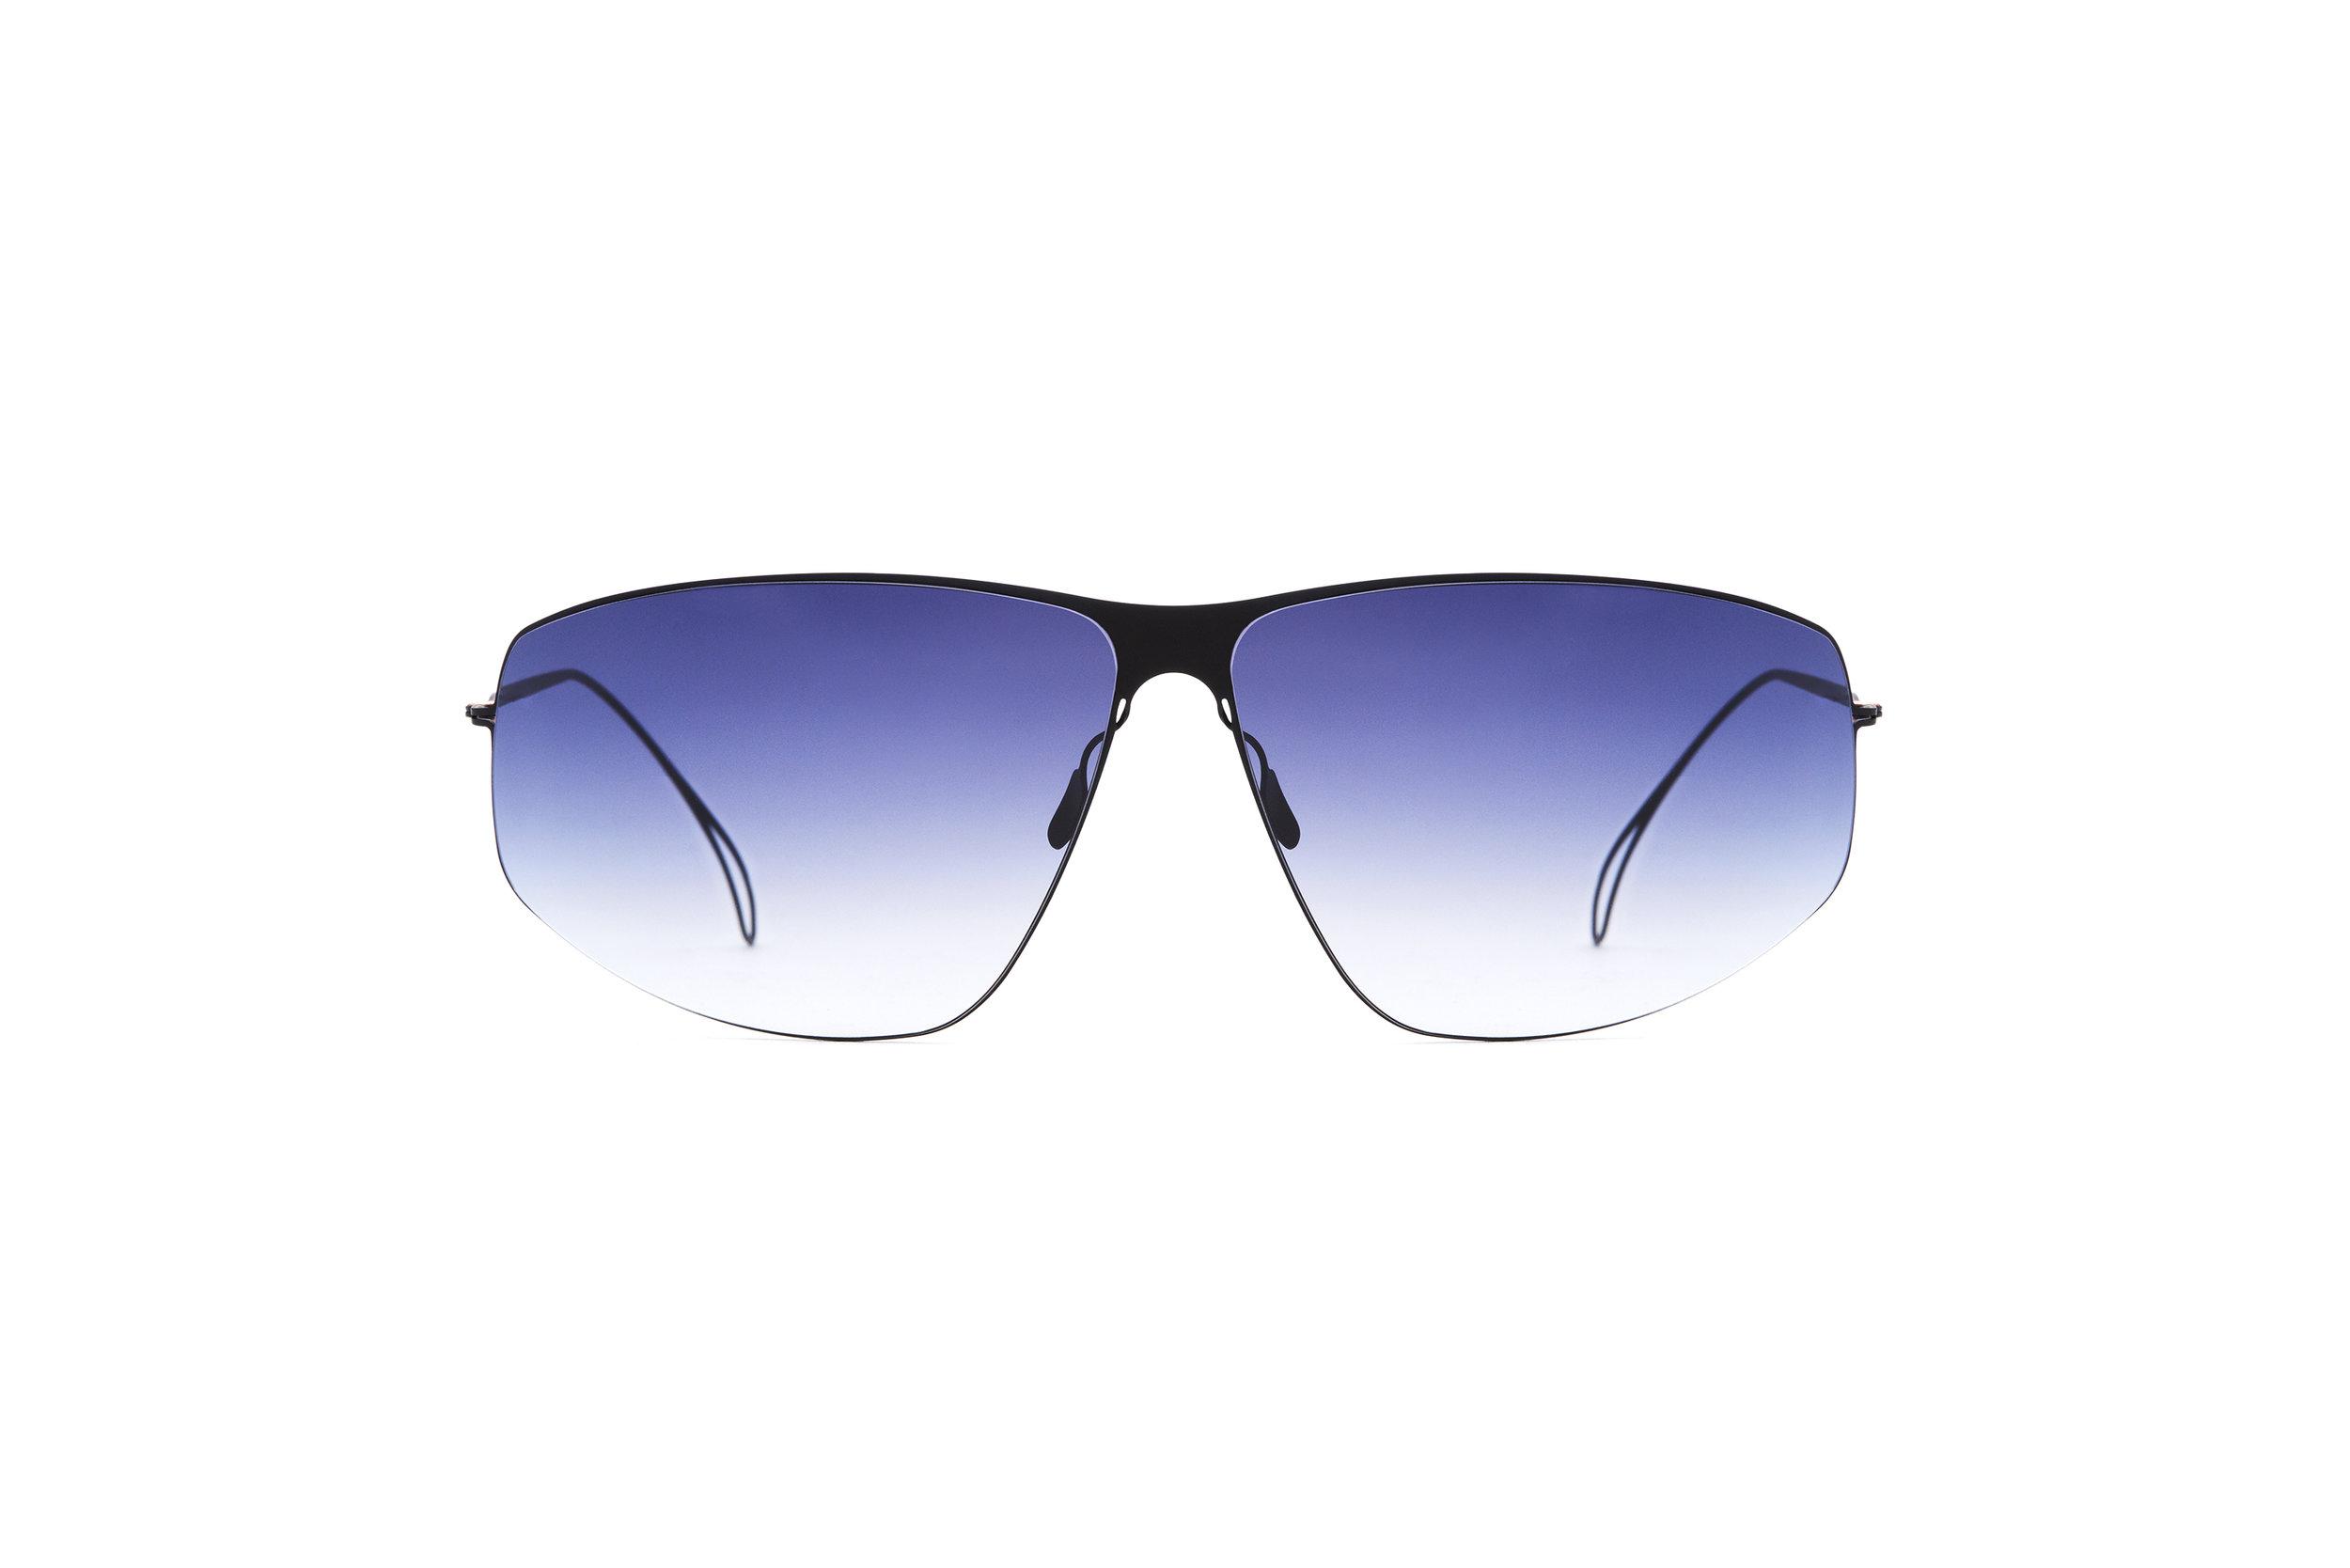 haffmans_neumeister_hunt_black_tempest_gradient_ultralight_sunglasses_front_102479.jpg